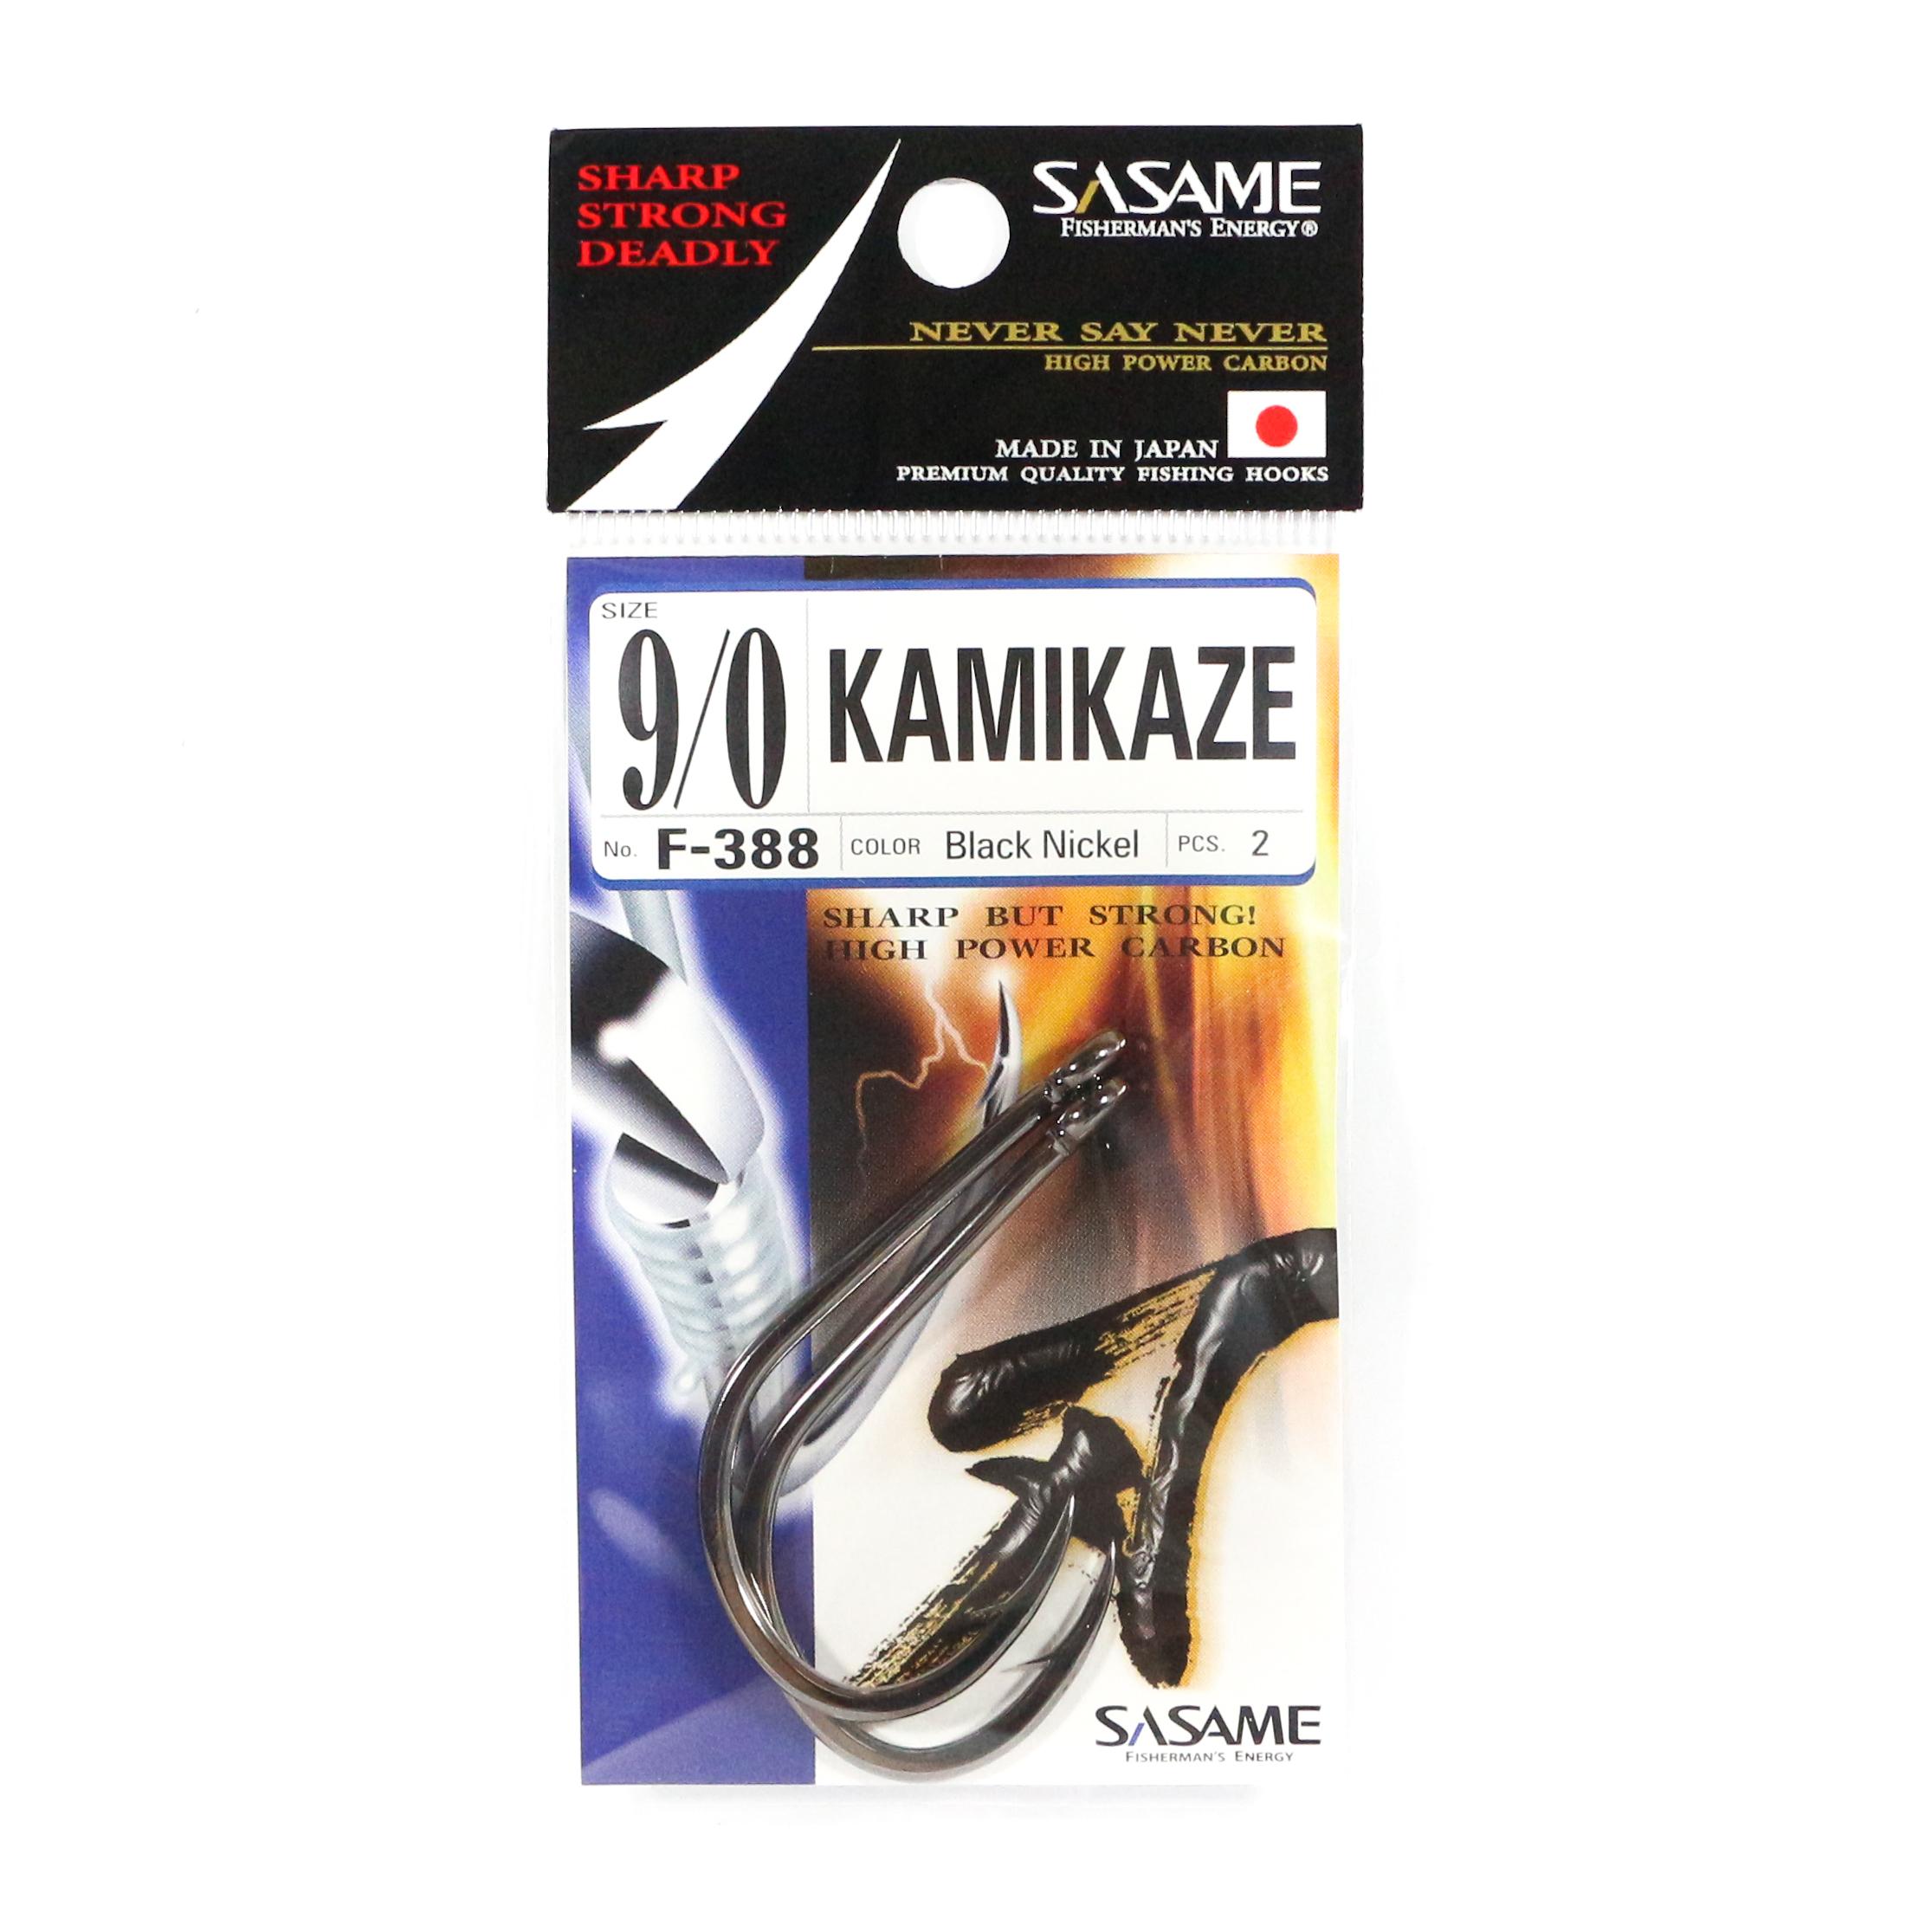 Sasame F-388 Kamikaze Straight Shank Offset Hook Size 9/0 (4798)